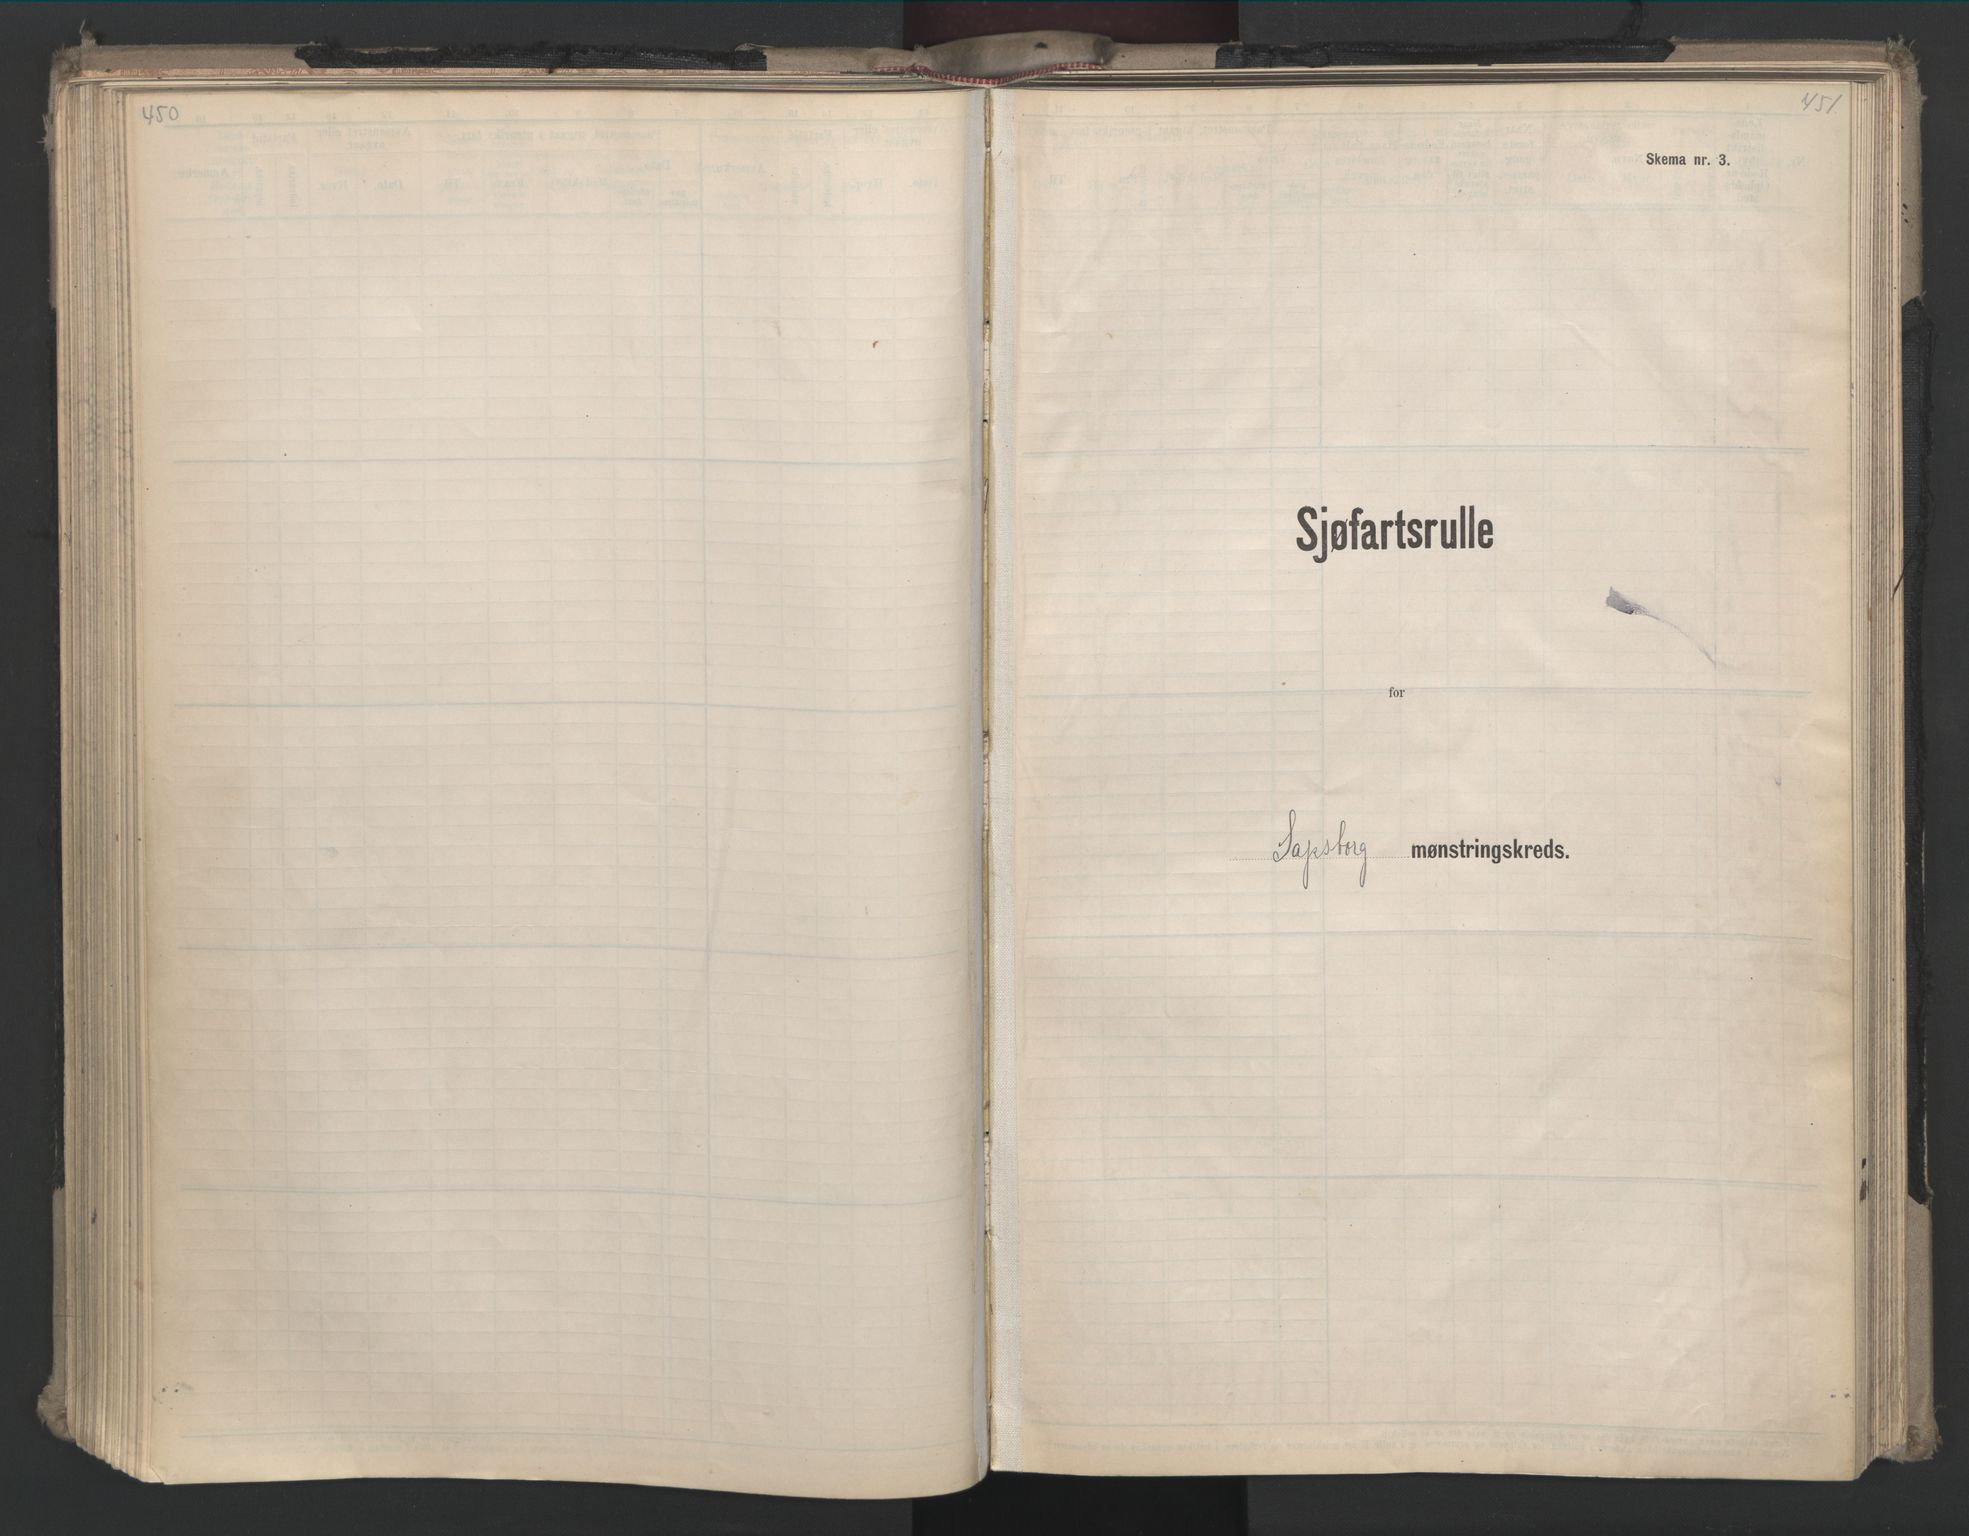 SAO, Oslo sjømannskontor, F/Fd/L0008: B-rulle, 1914, s. 450-451